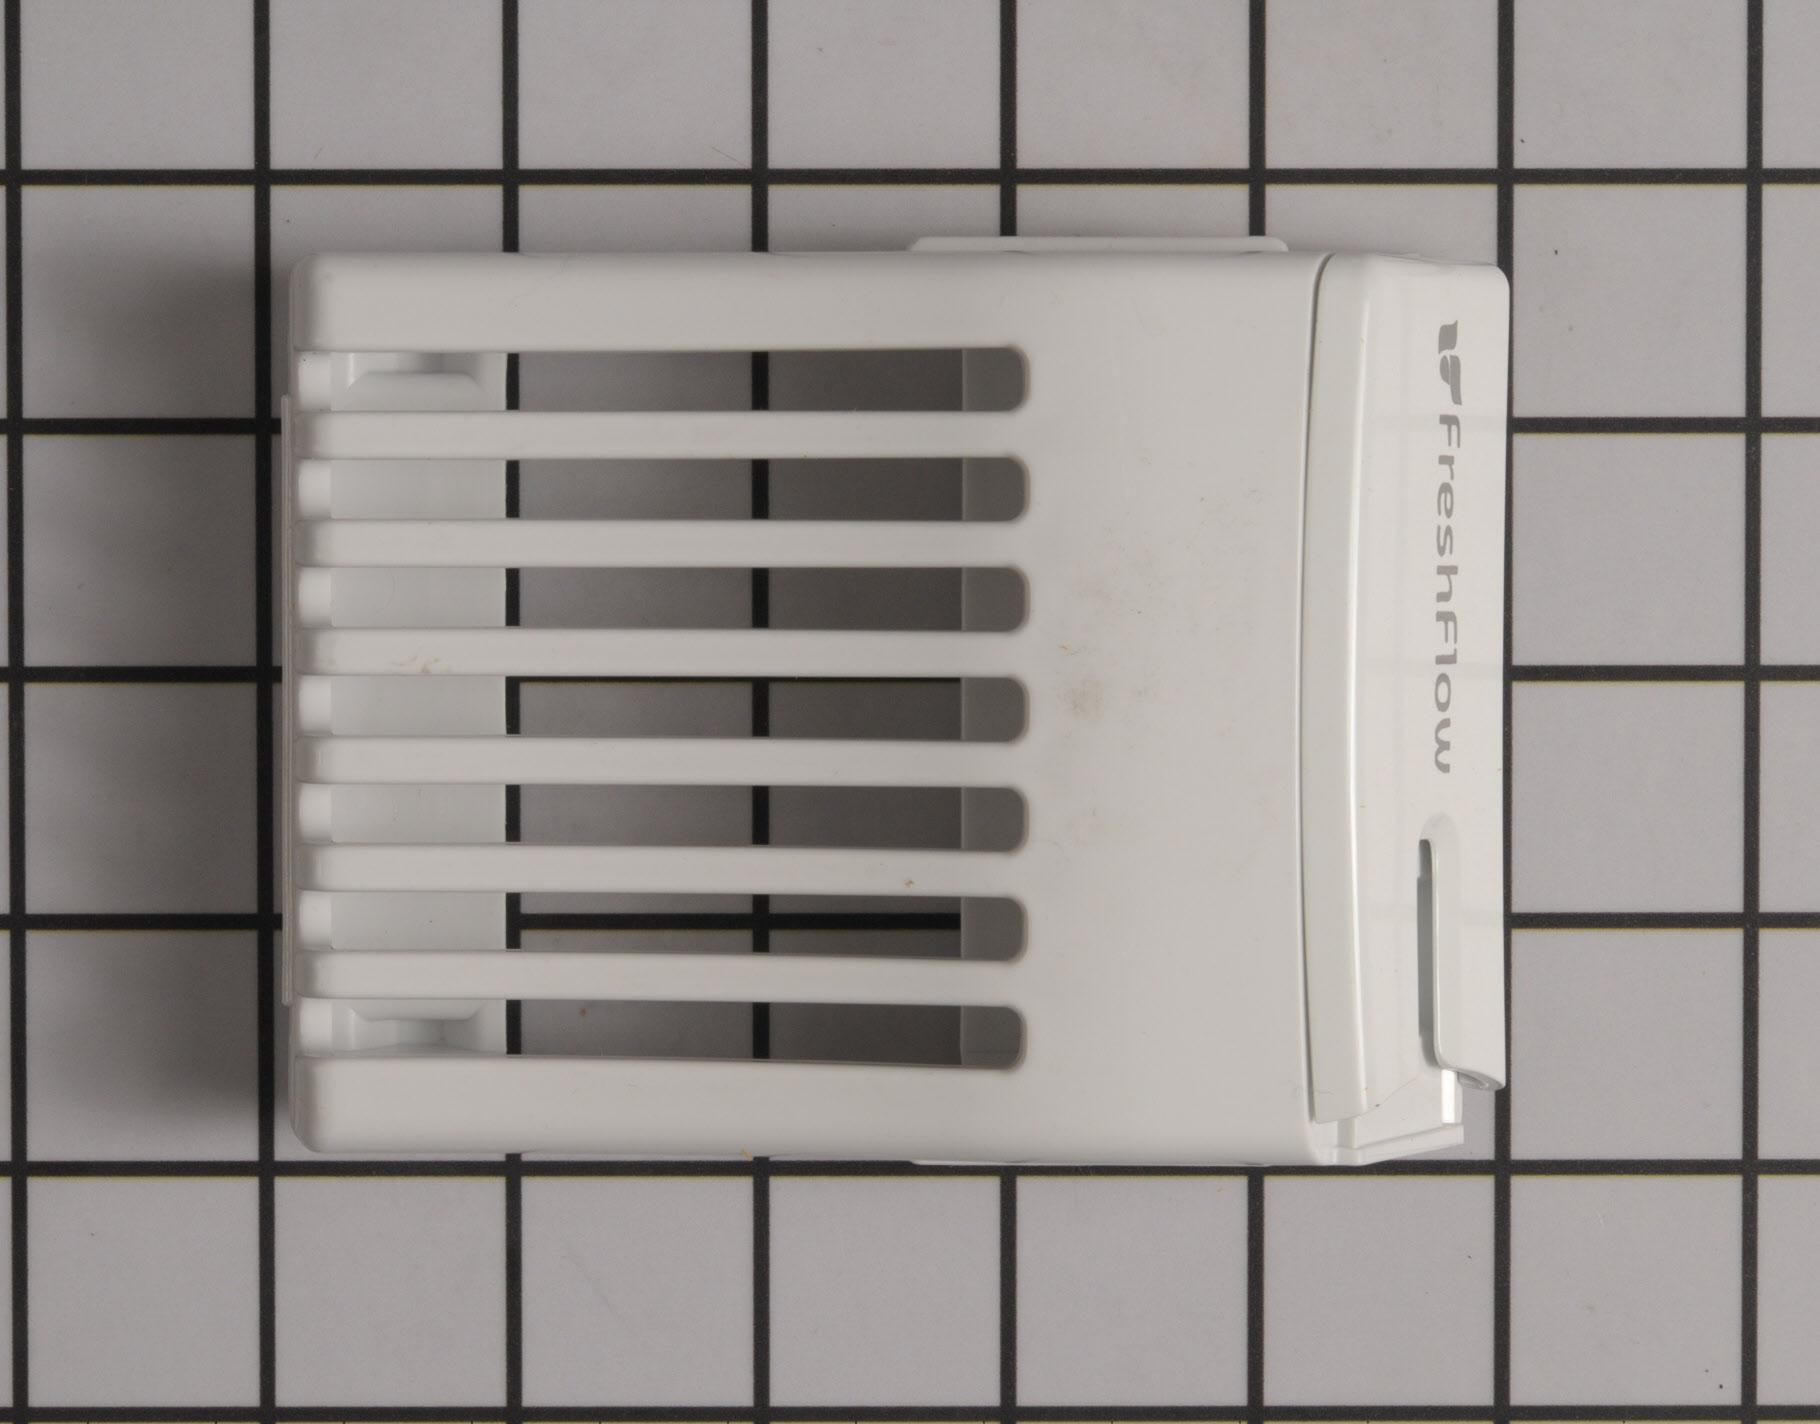 KitchenAid Refrigerator Part # WPW10408747 - Filter Cover